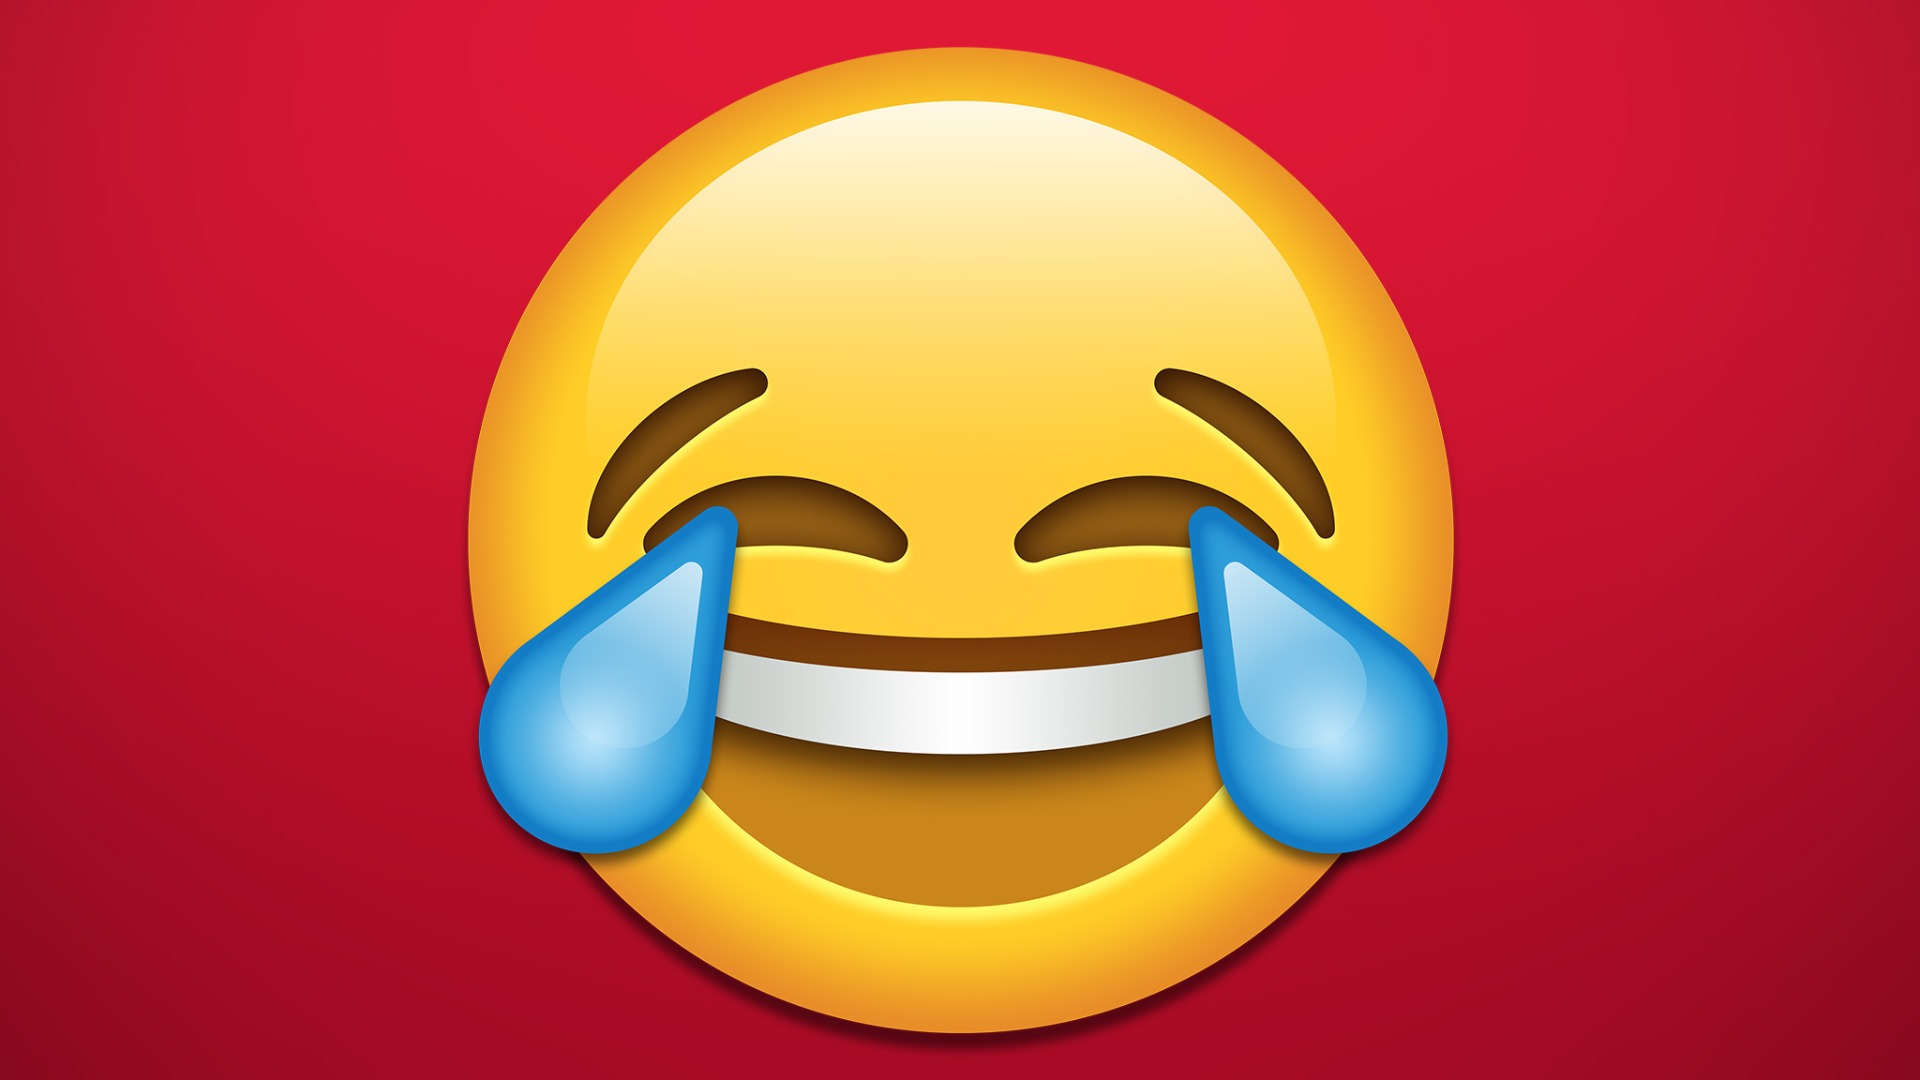 emoji care rade cu lacrimi